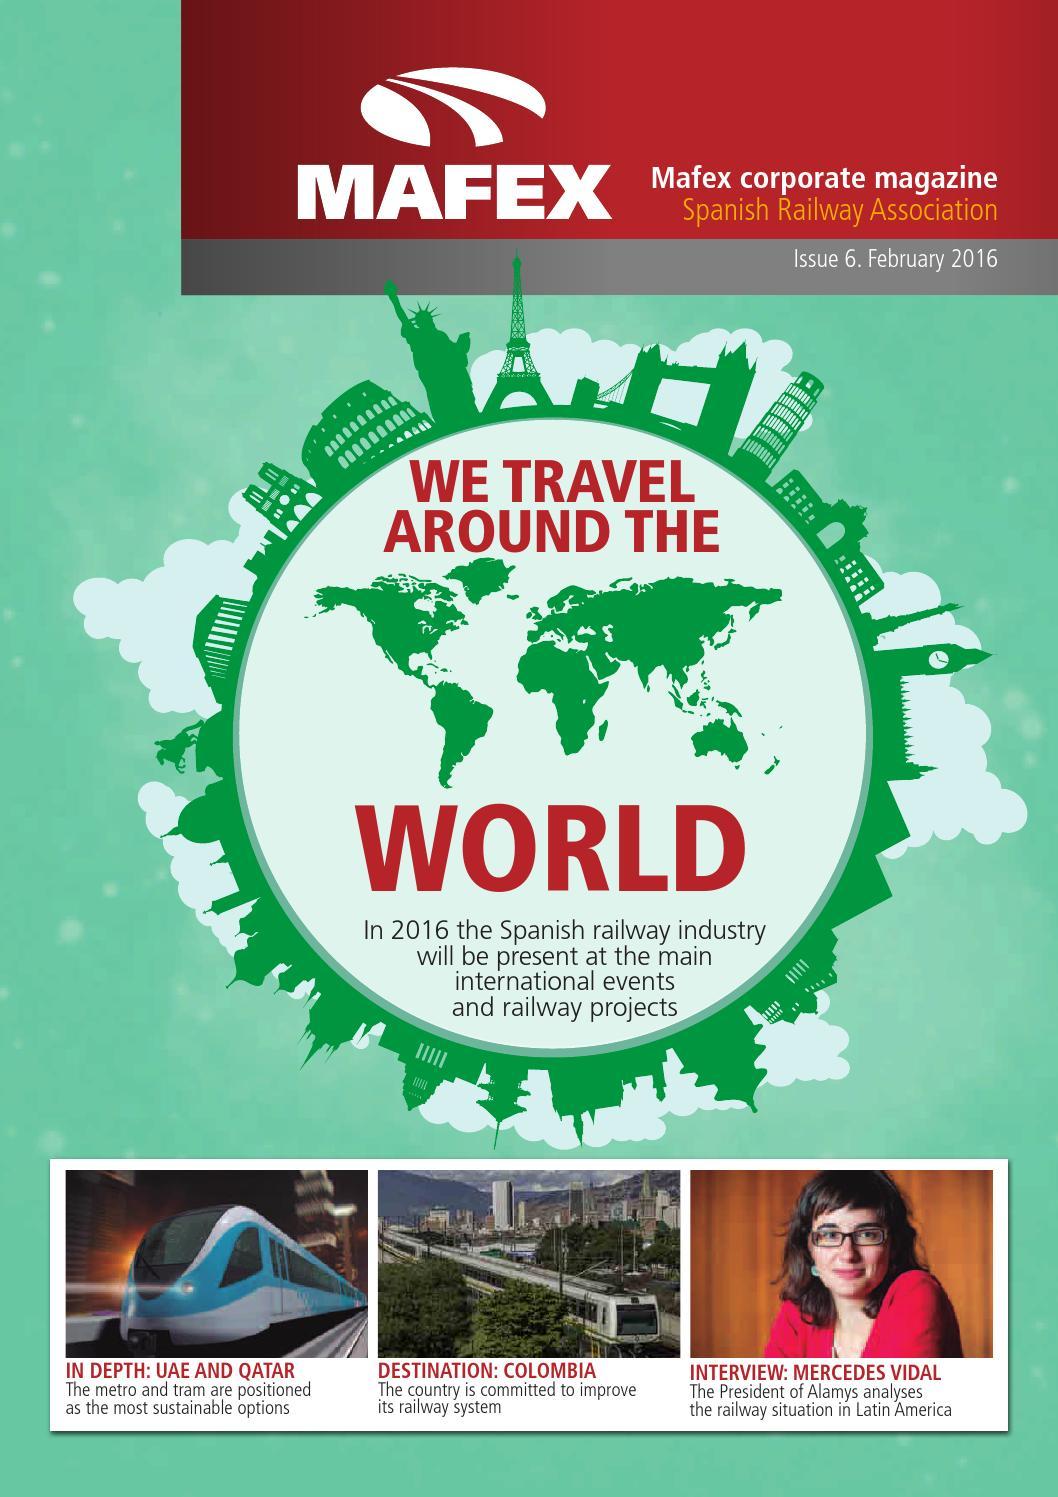 Mafex Corporative Magazine (6) by Mafex Revista Corporativa